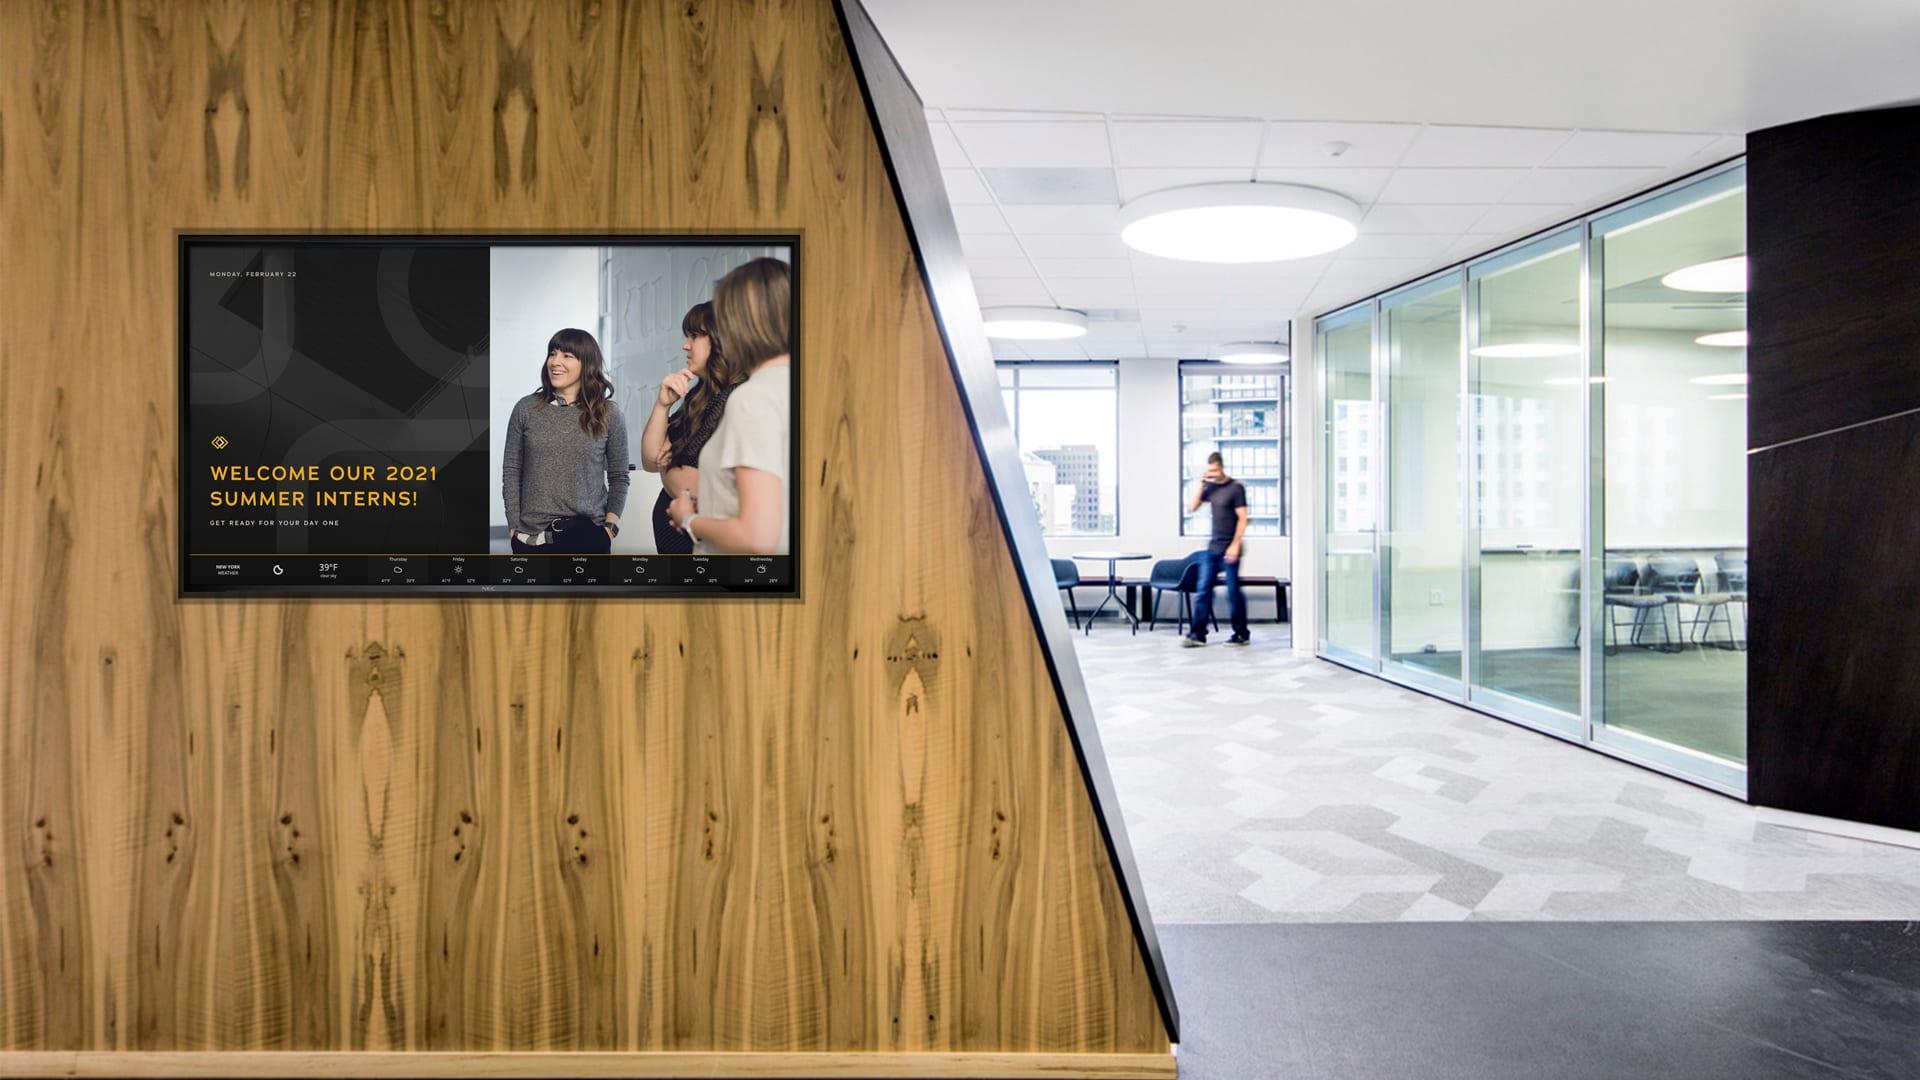 Office Lobby greeting digital signage